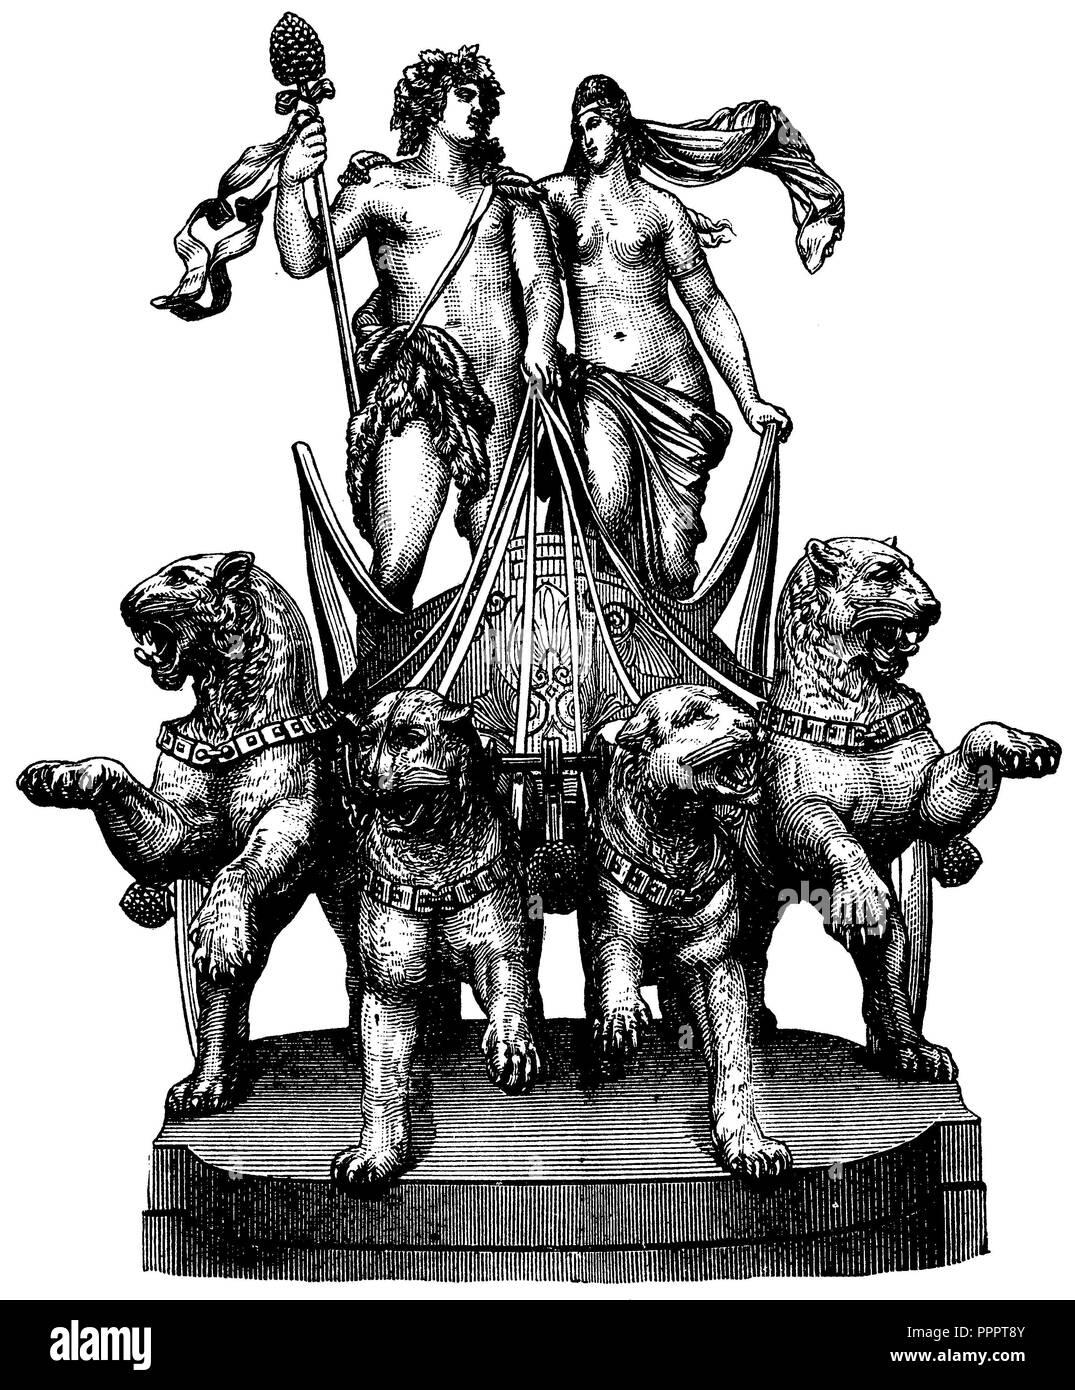 Dionysus and Ariadne. Quadriga at the Dresdner Hoftheater. By Johannes Schilling, Johannes Schilling Stock Photo